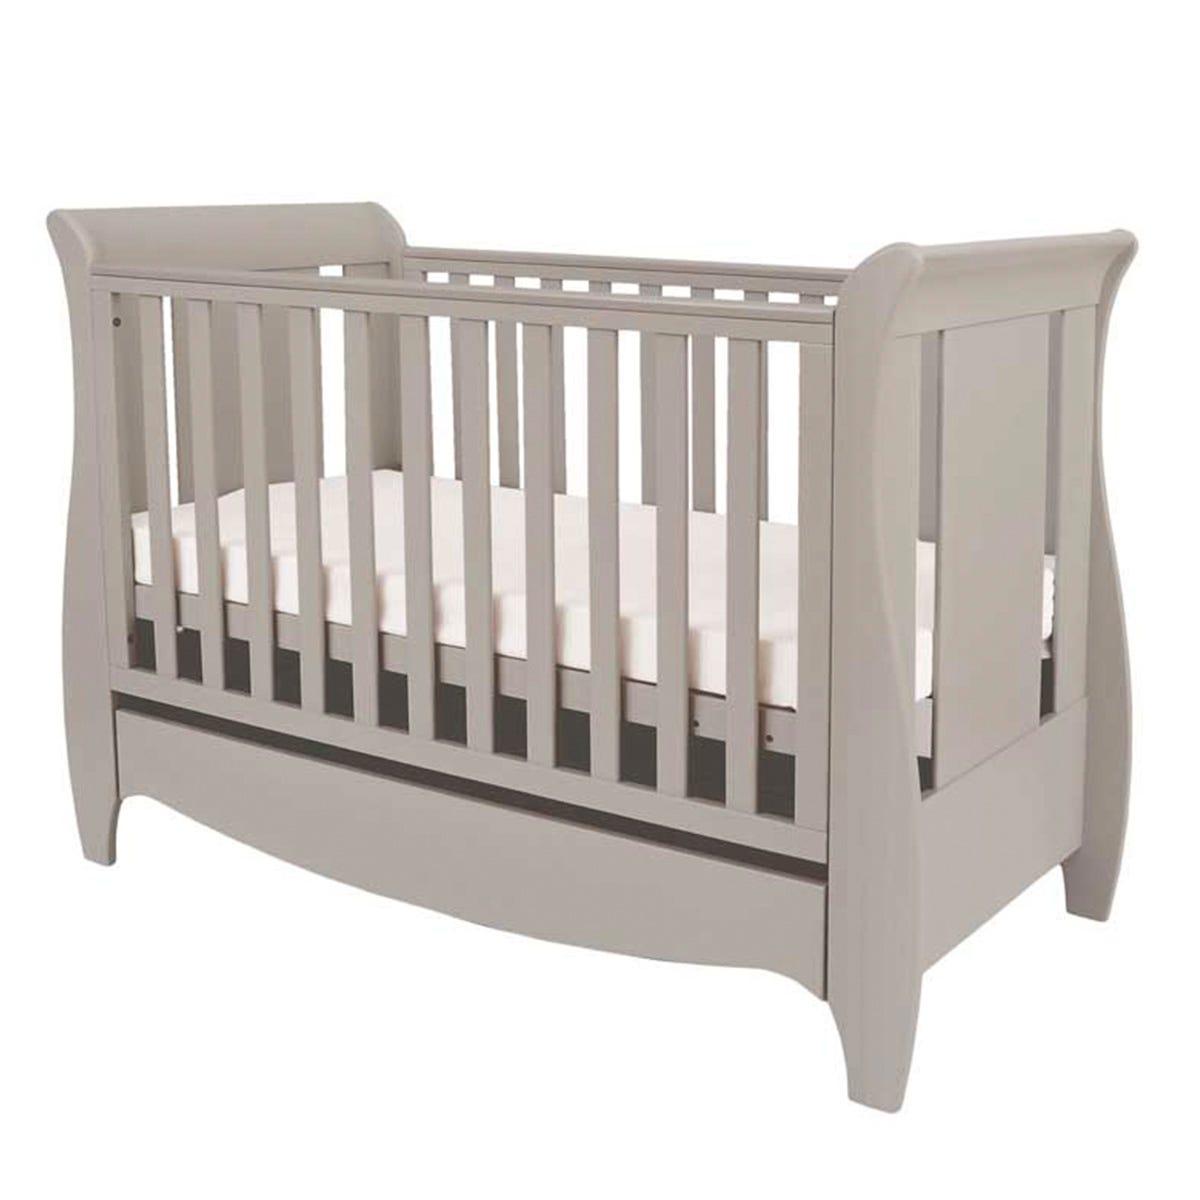 Tutti Bambini Roma Mini Sleigh Cot Bed with Drawer - Truffle Grey